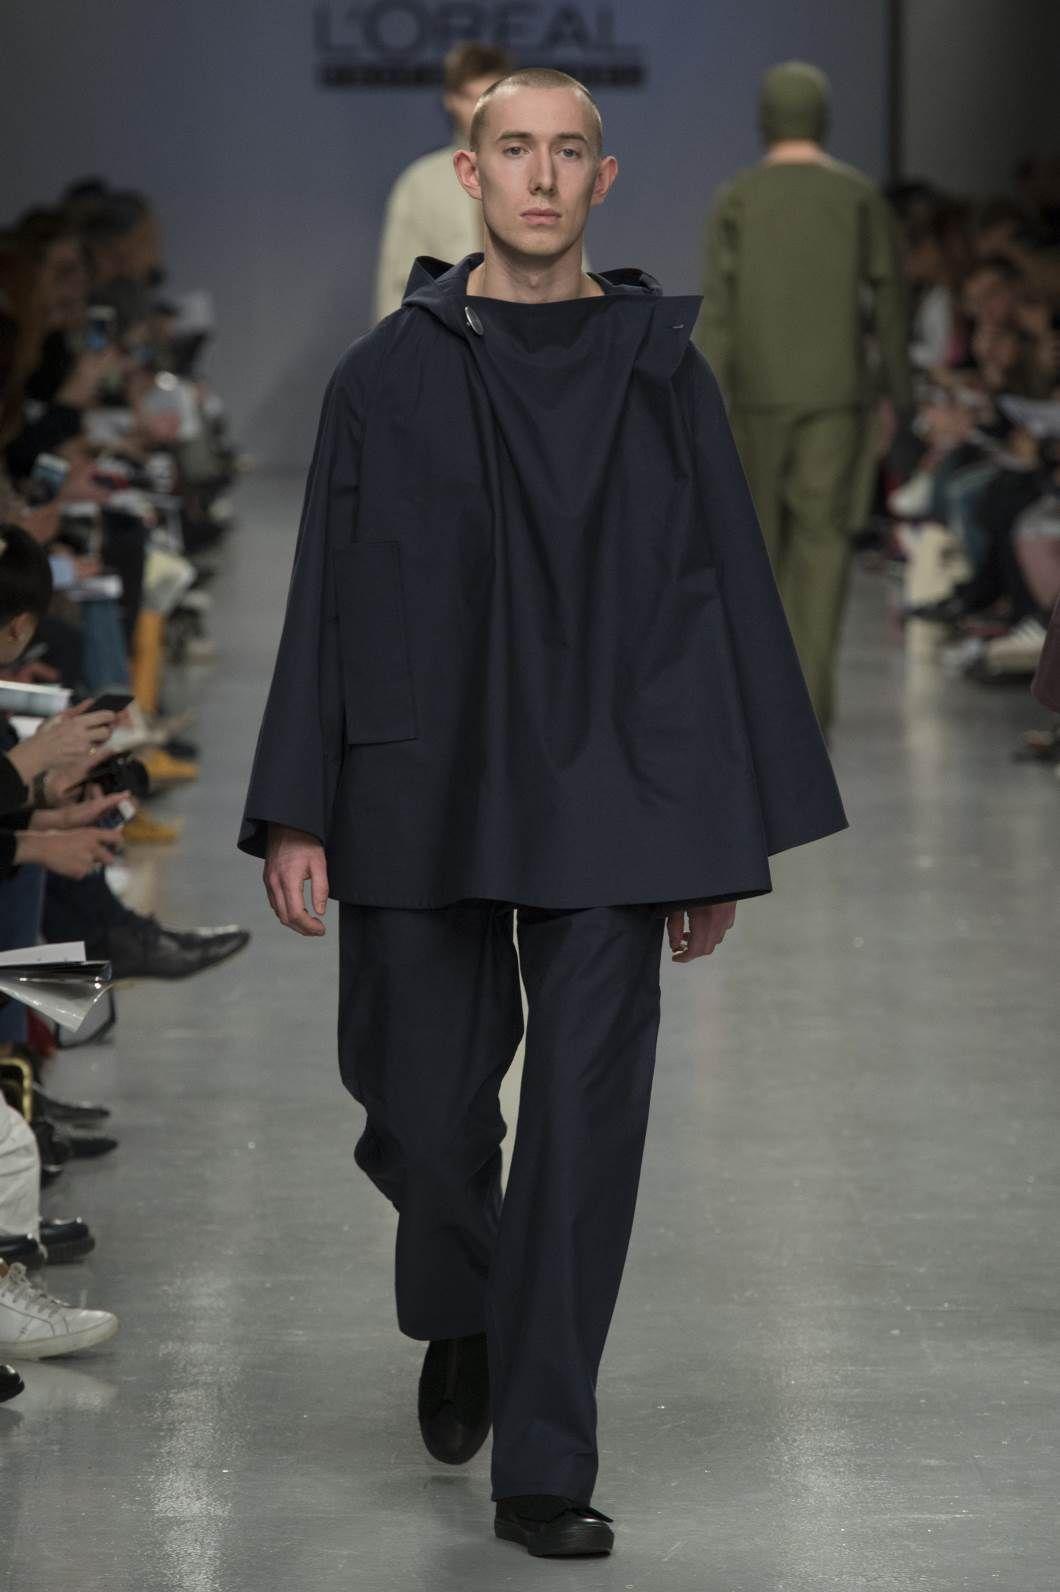 Male Fashion Trends: Central Saint Martins Fall-Winter 2017 - London Fashion Week